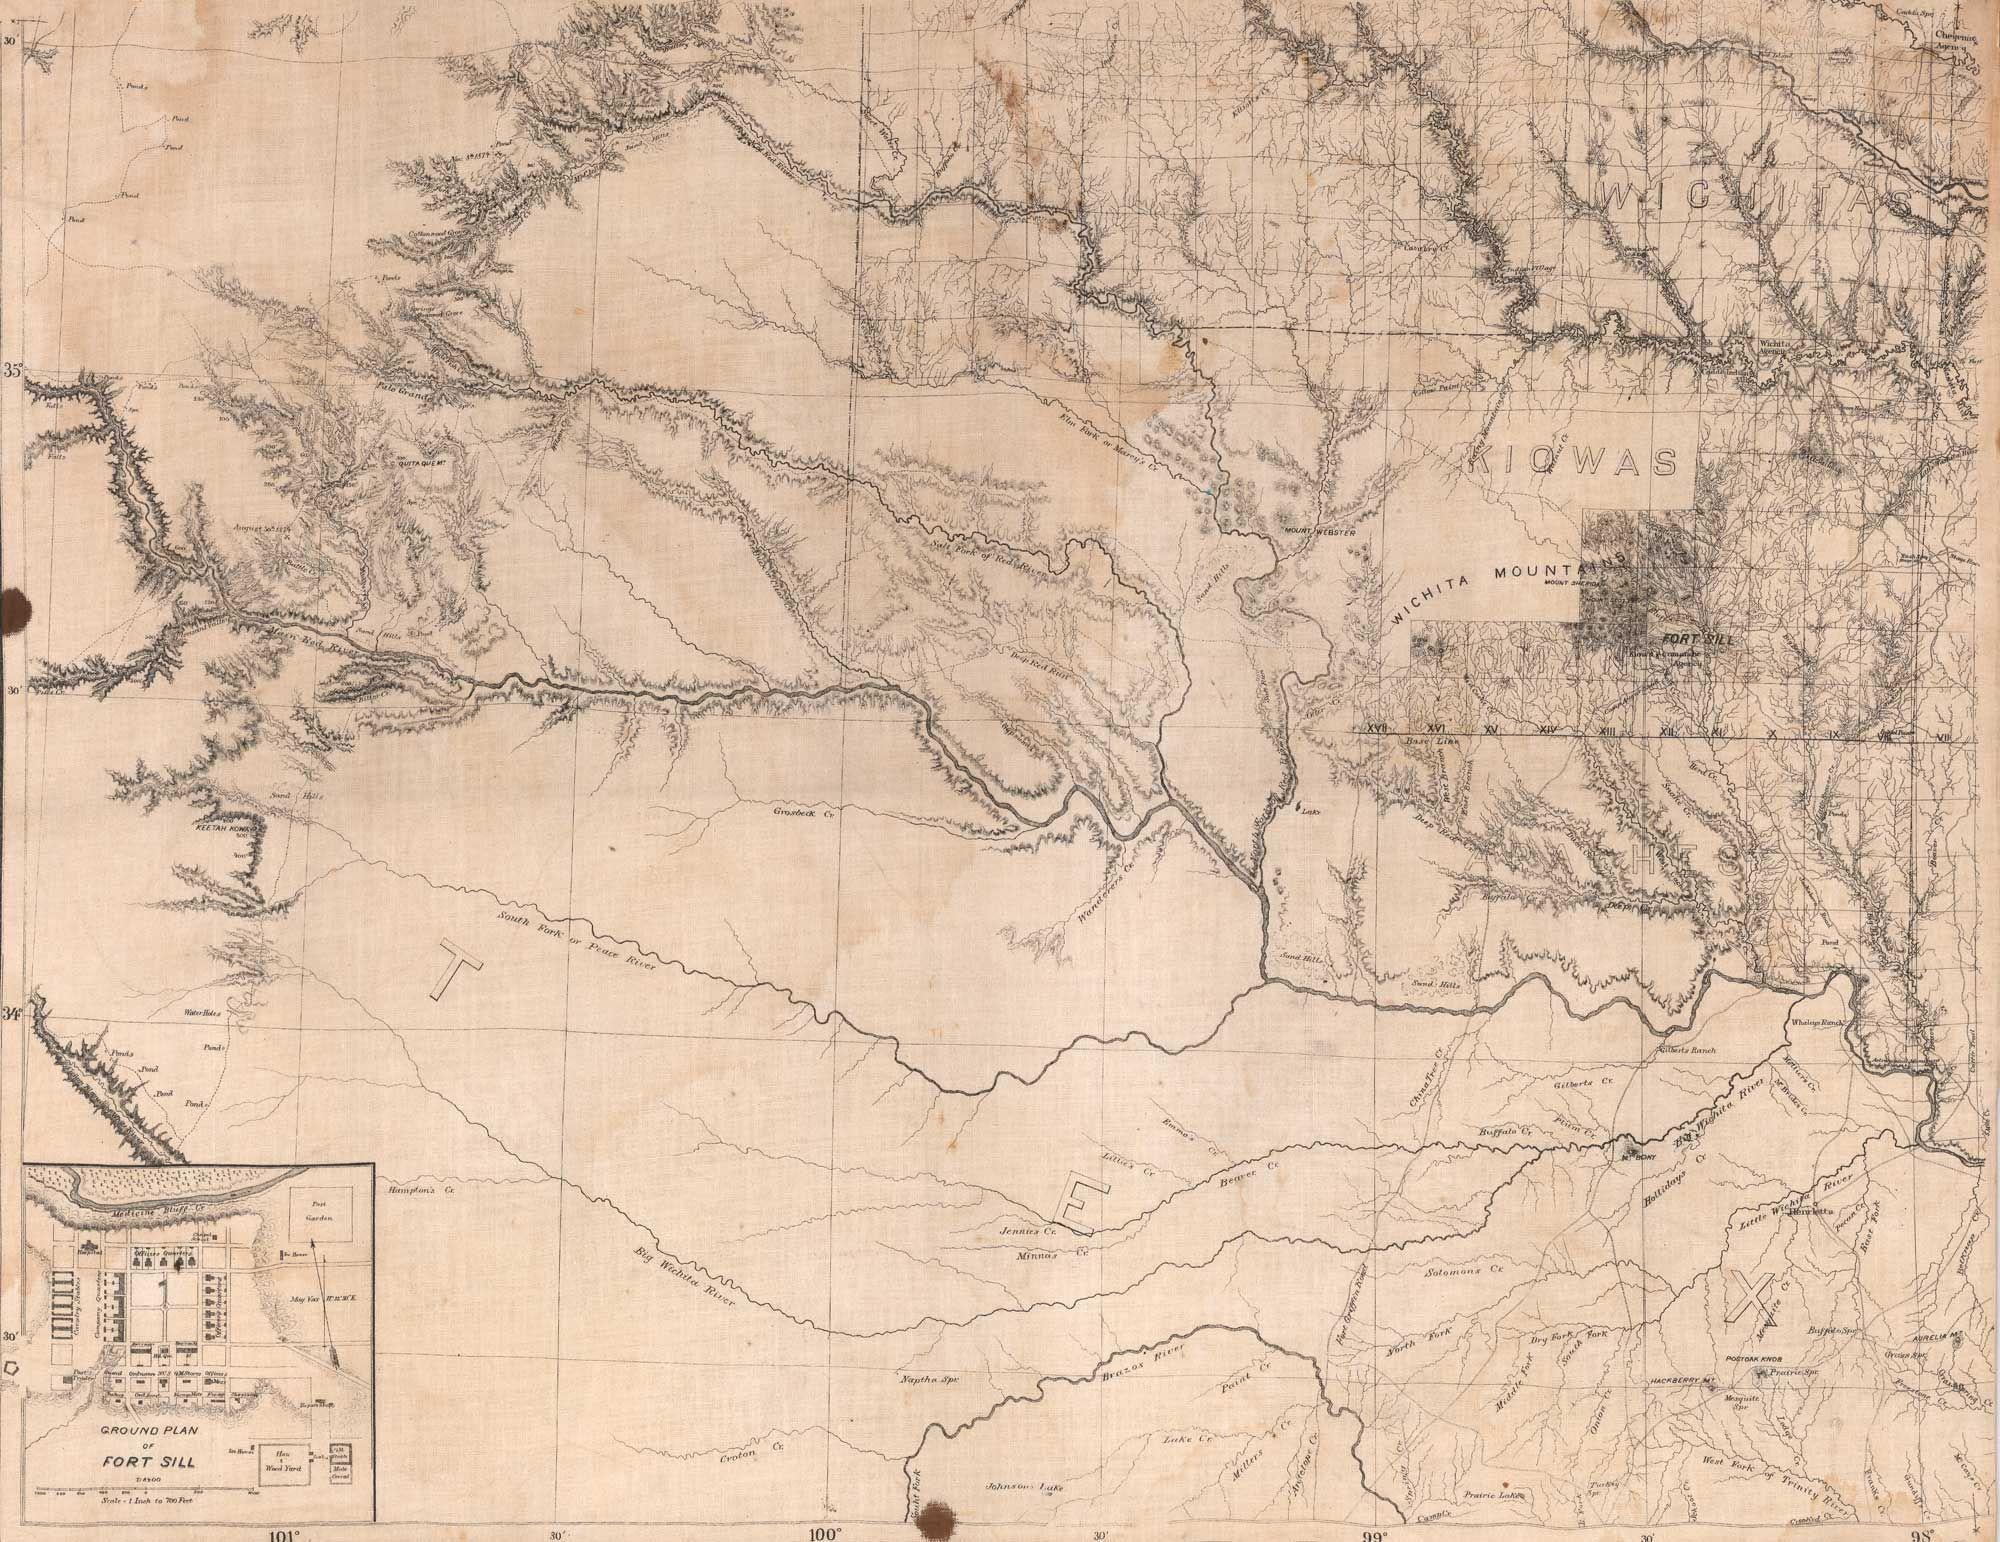 Oklahoma Civil War Sesquicentennial Kiowa Nation W Ground Plan